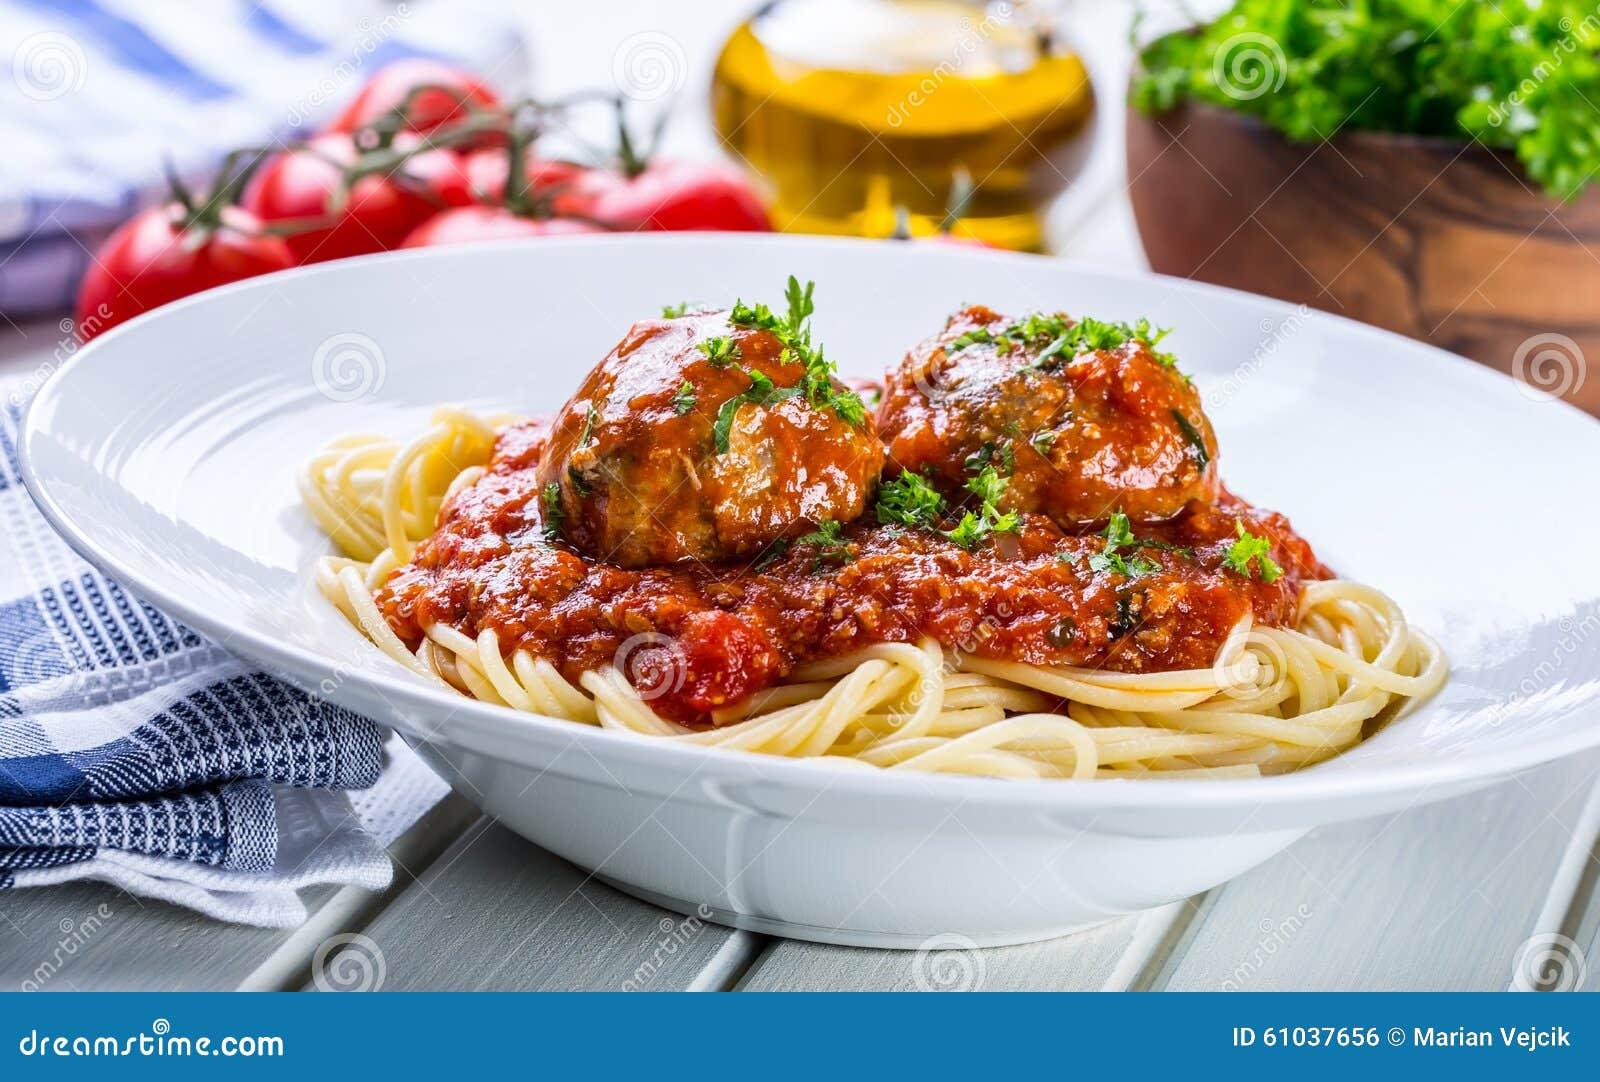 Meat balls italian and mediterranean cuisine meat balls for Afghan cuisine sugar land menu